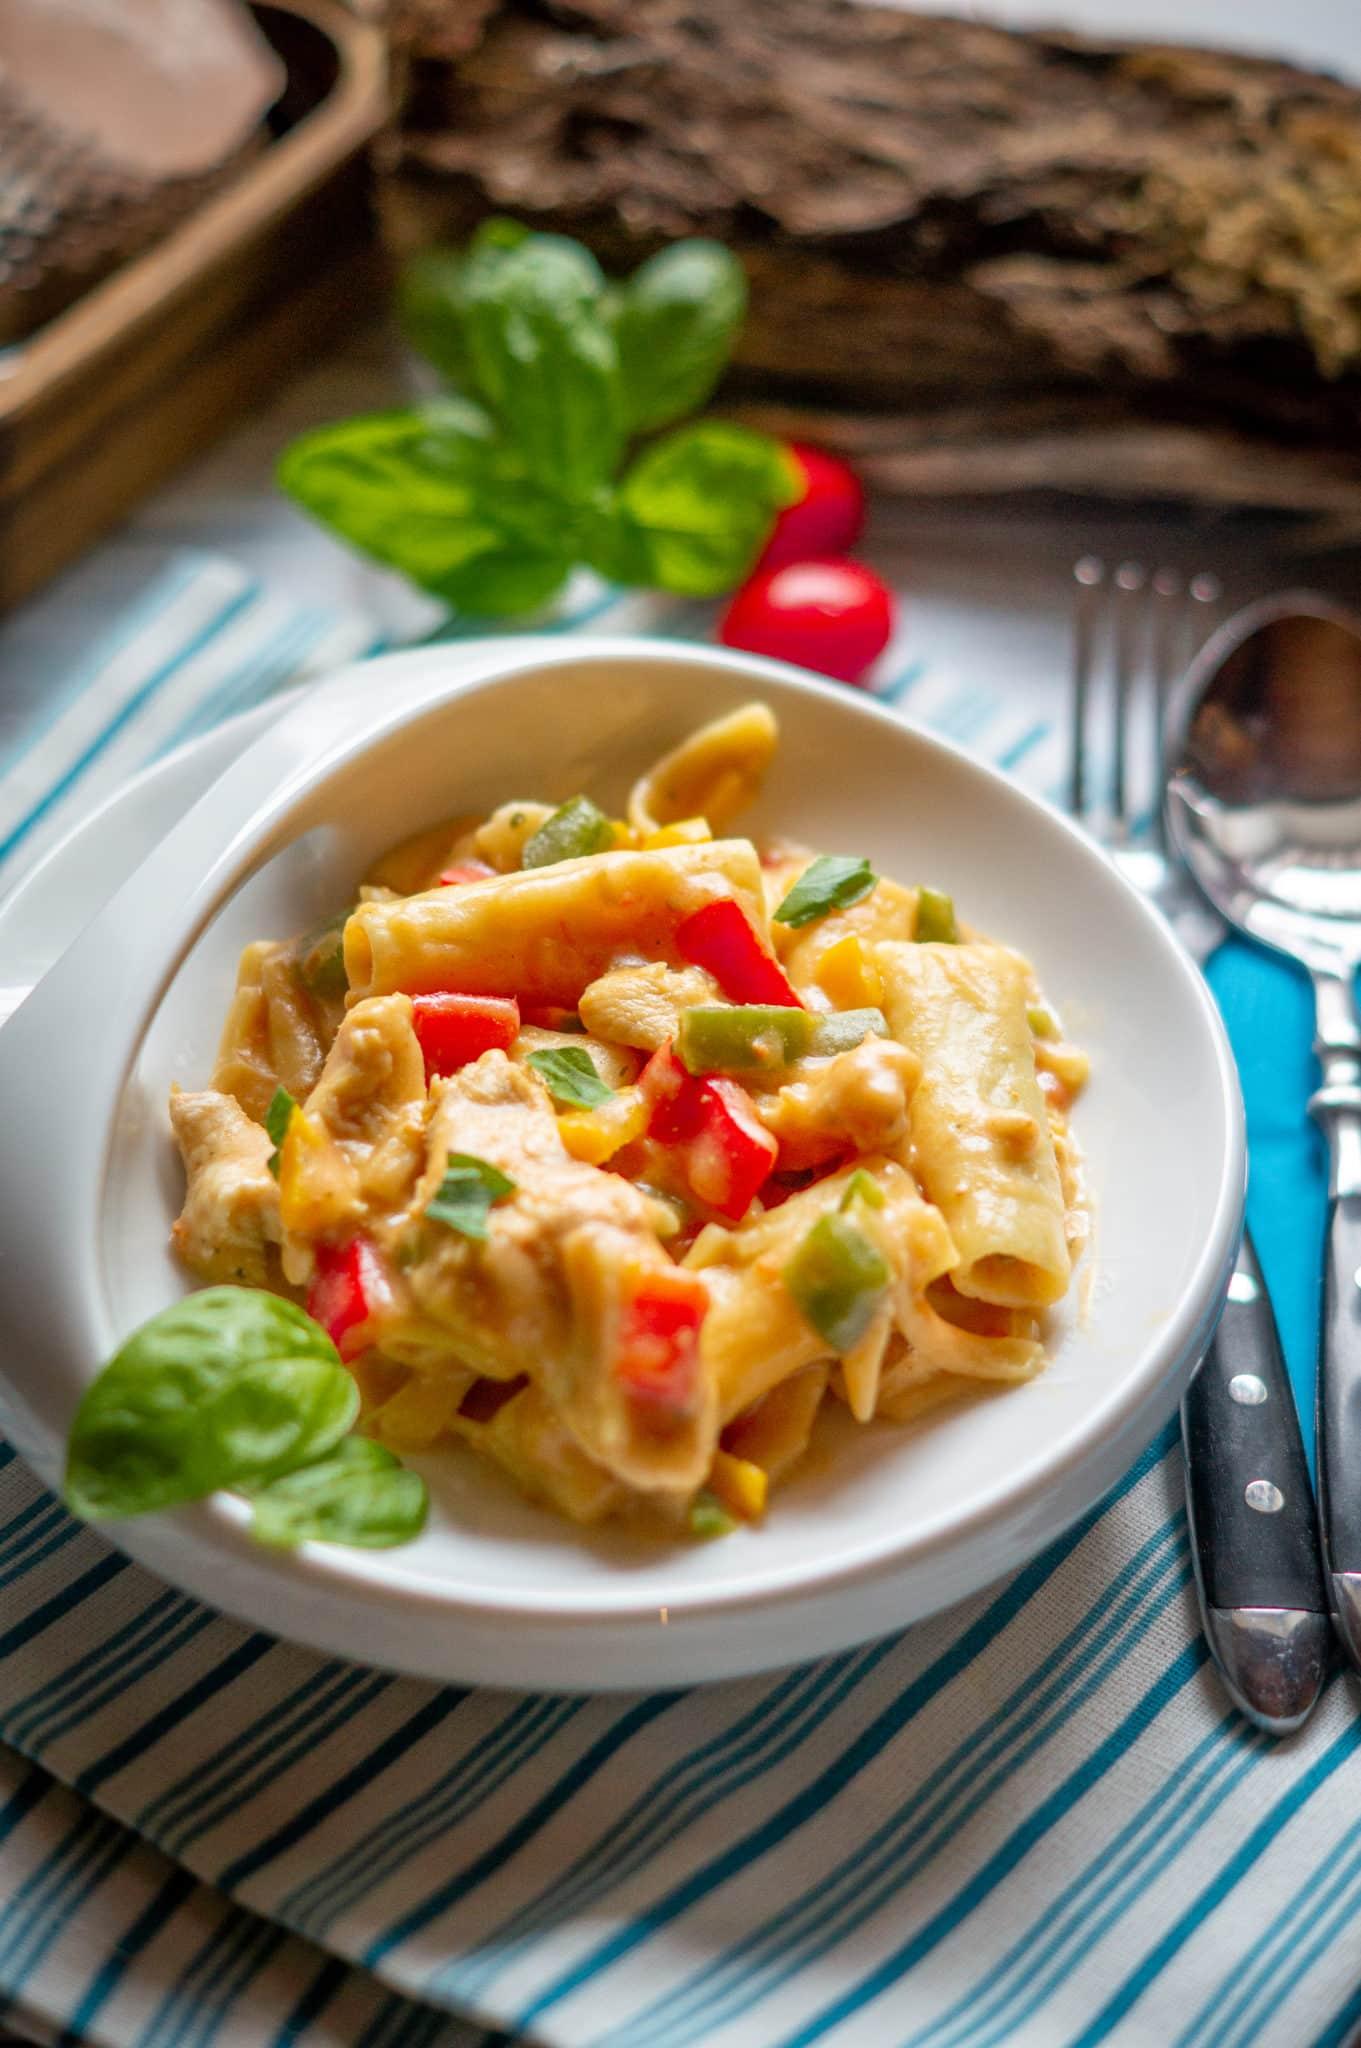 All in One - Hühnchen-Paprika-Tortiglioni aus dem Thermomix® Pin